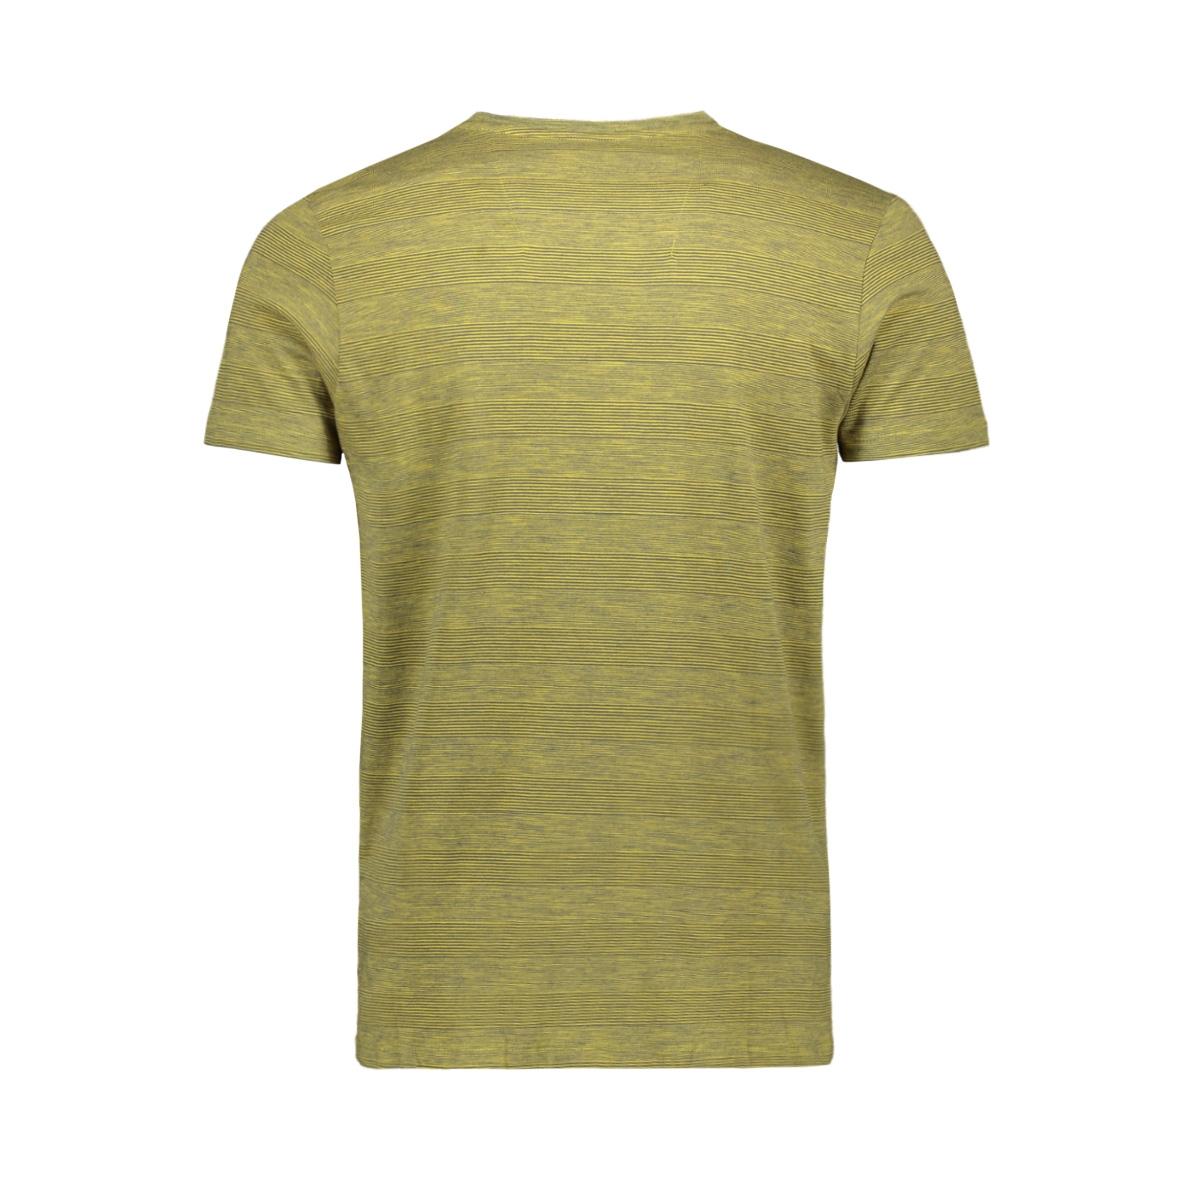 t shirt met borstzakje gs910700 garcia t-shirt 2911 golden olive